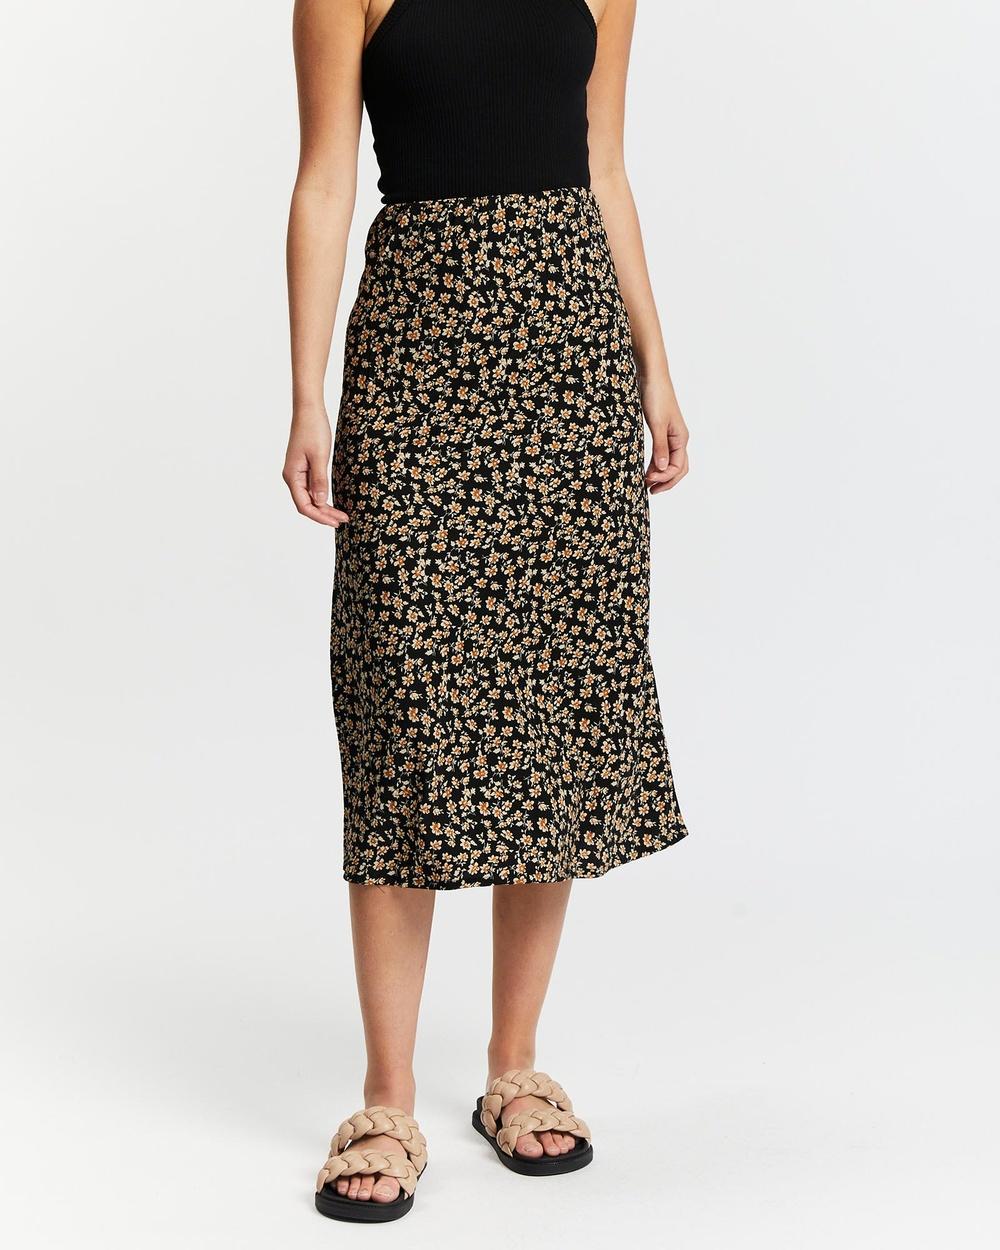 All About Eve Kali Midi Skirt Skirts Black